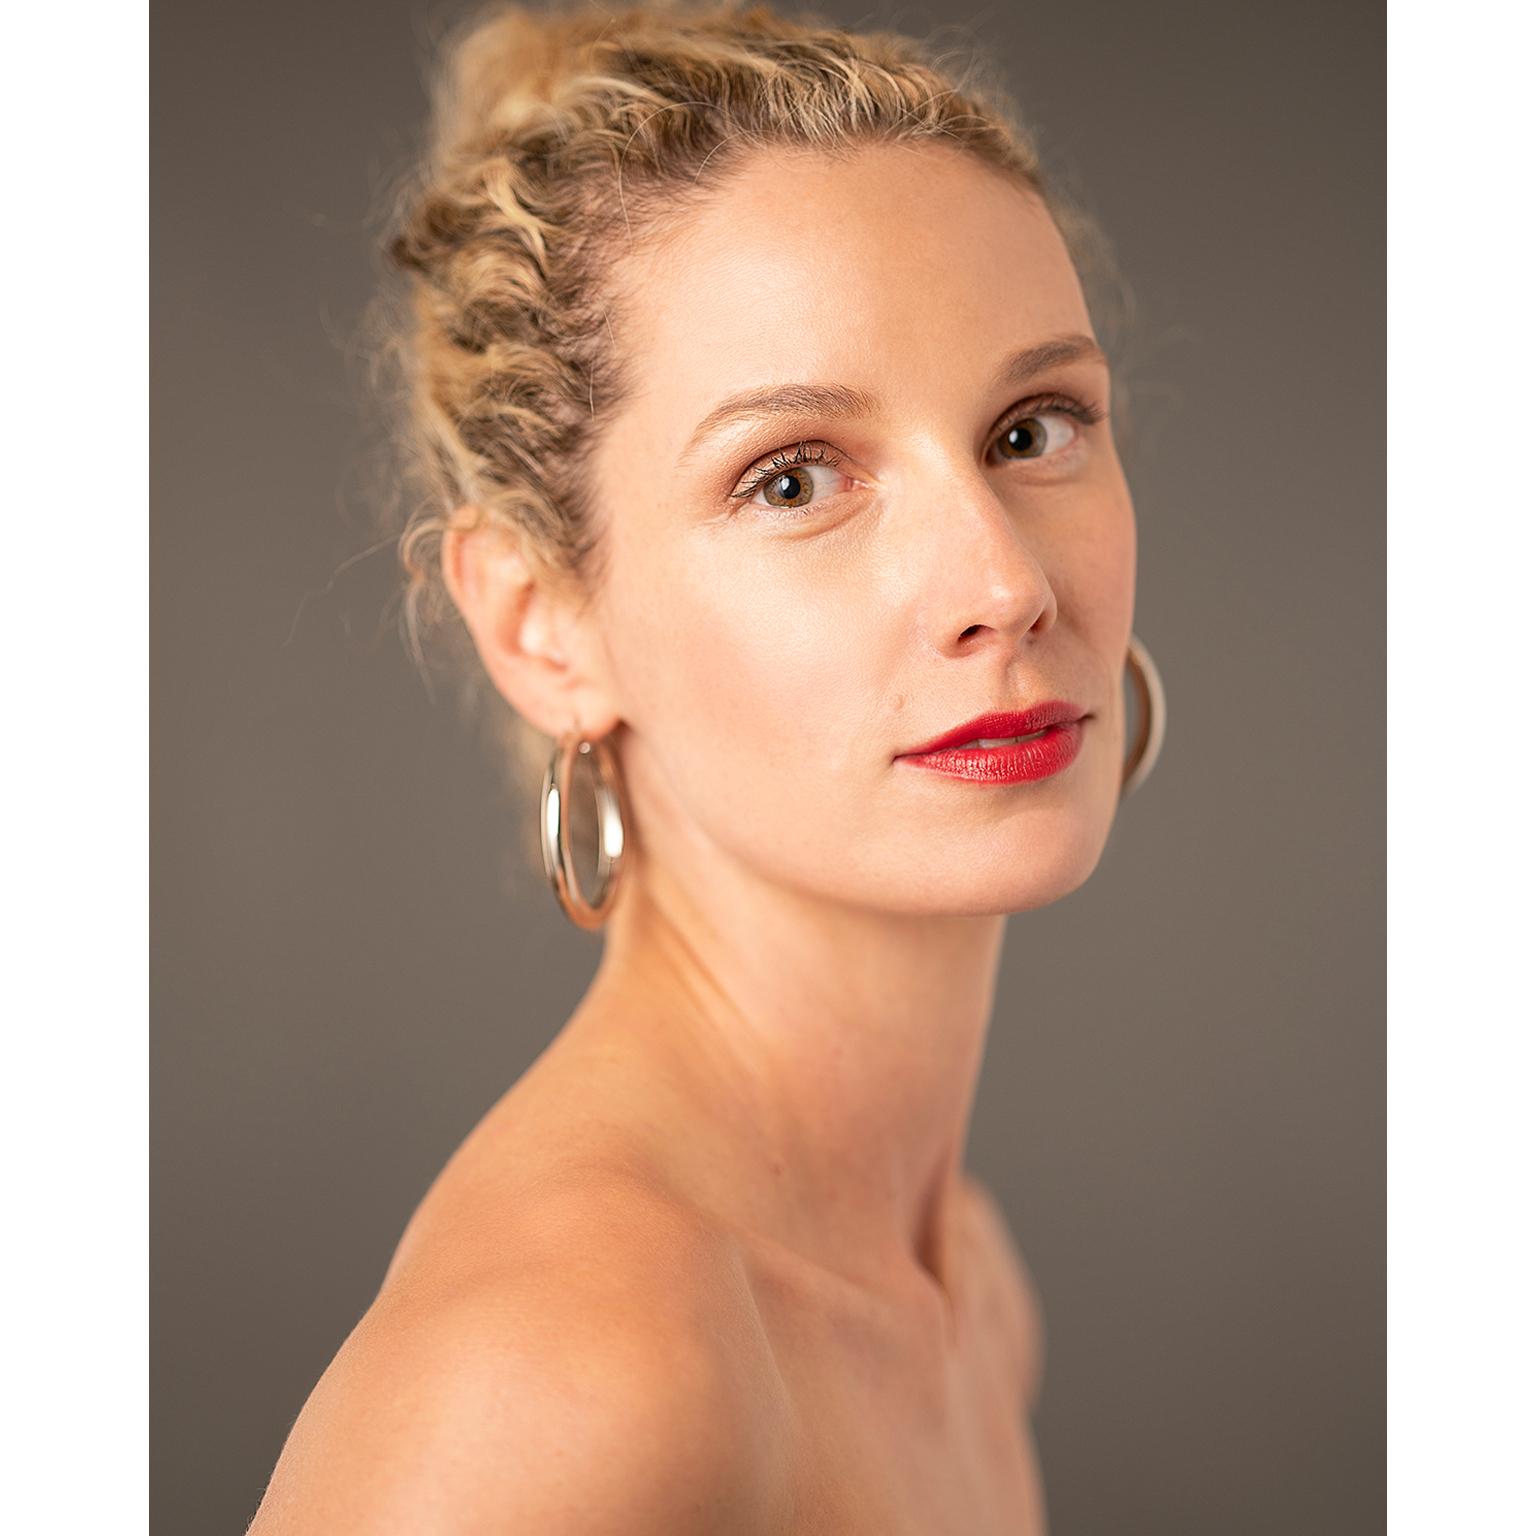 Toronto-Fitness-Model-Agency-Commercial-Beauty-Lifestyle-Tiffany-Babiak